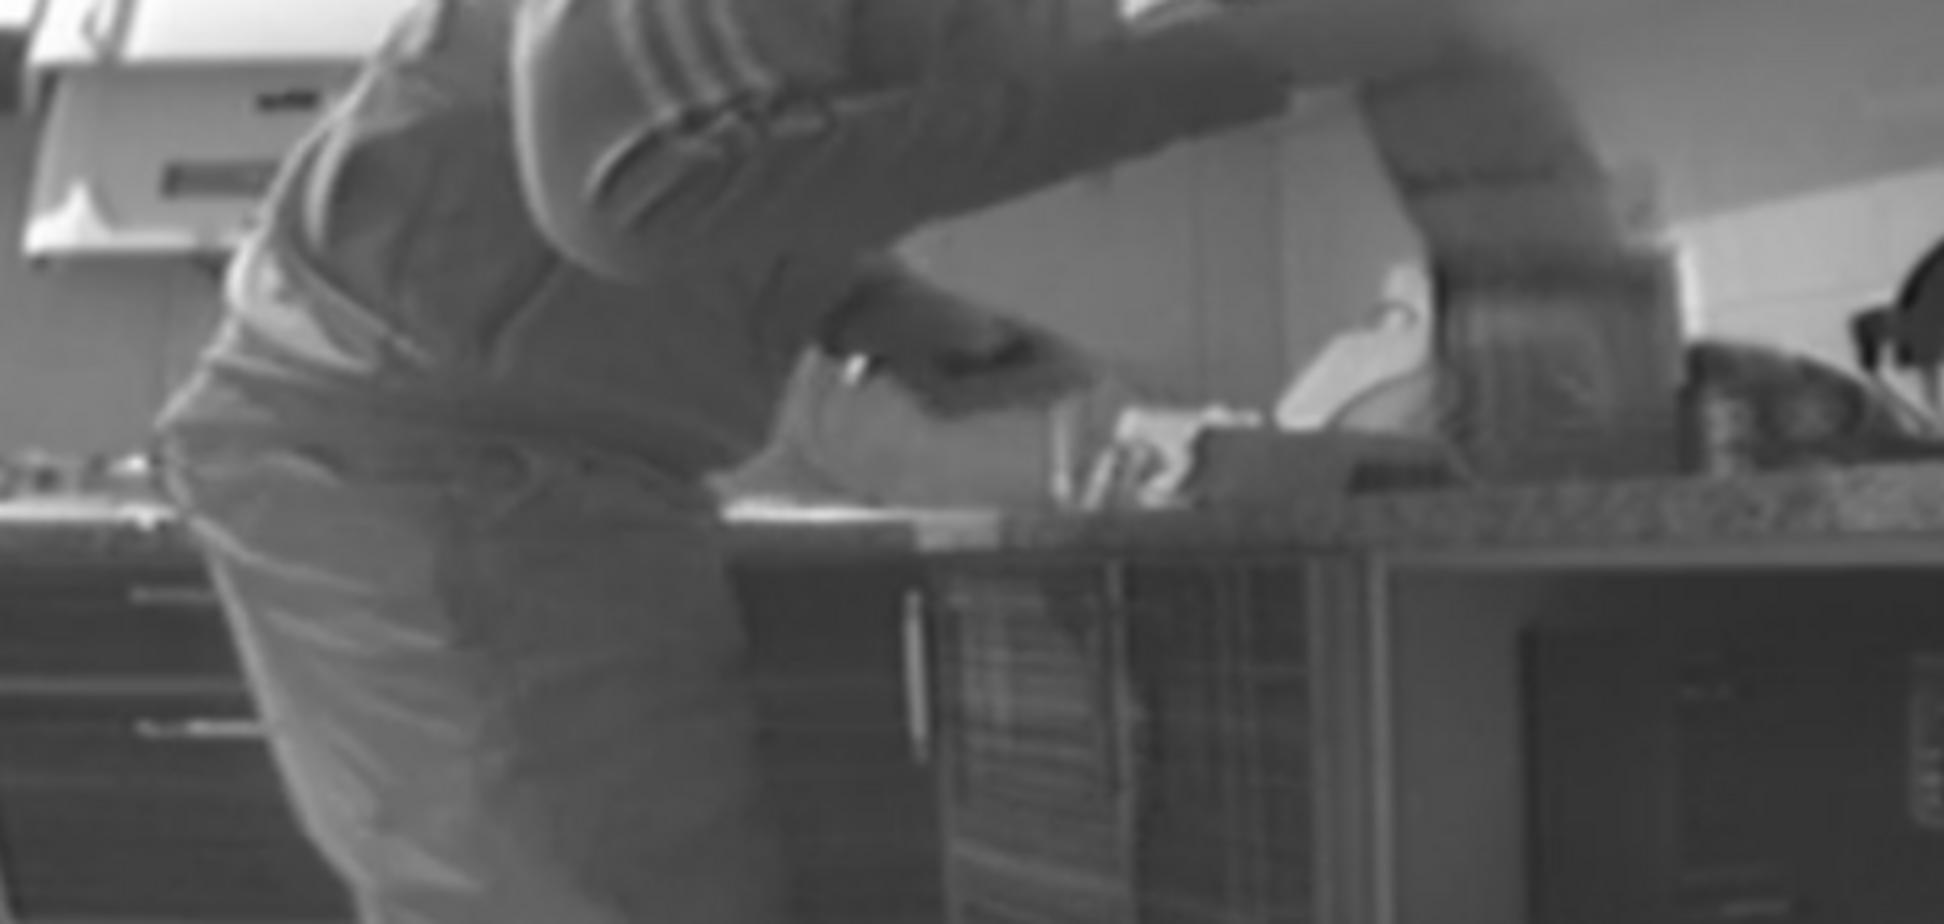 ГПУ сняла на видео, как запорожский прокурор употребляет наркотики (ВИДЕО)